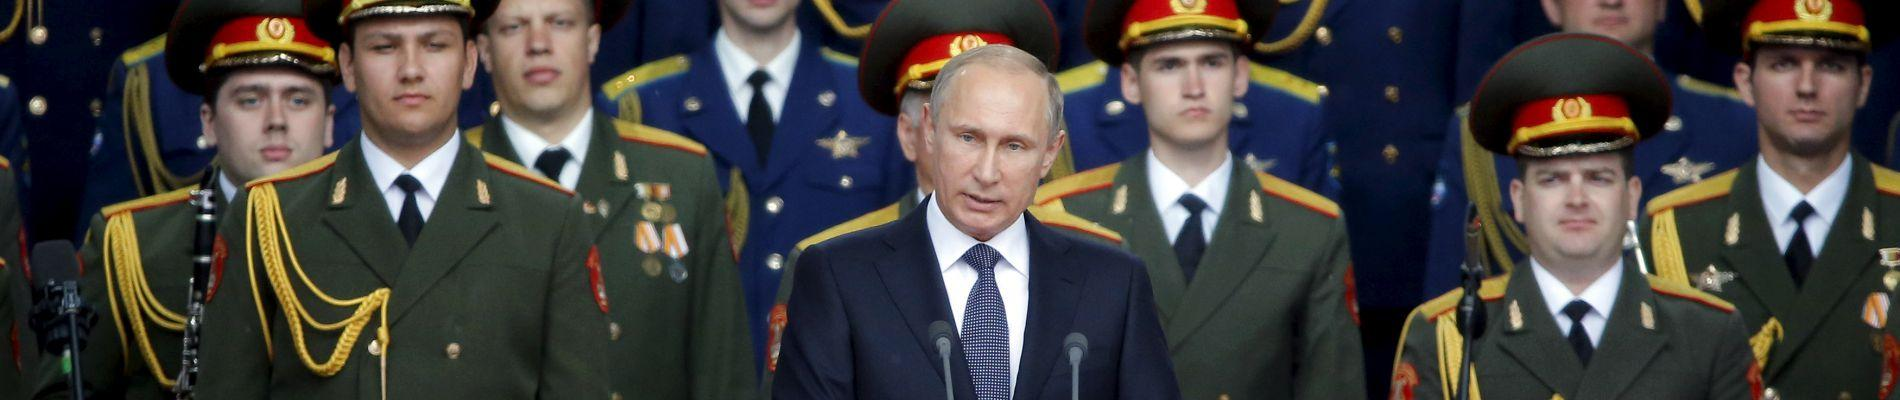 The Rise of Putin's Russia